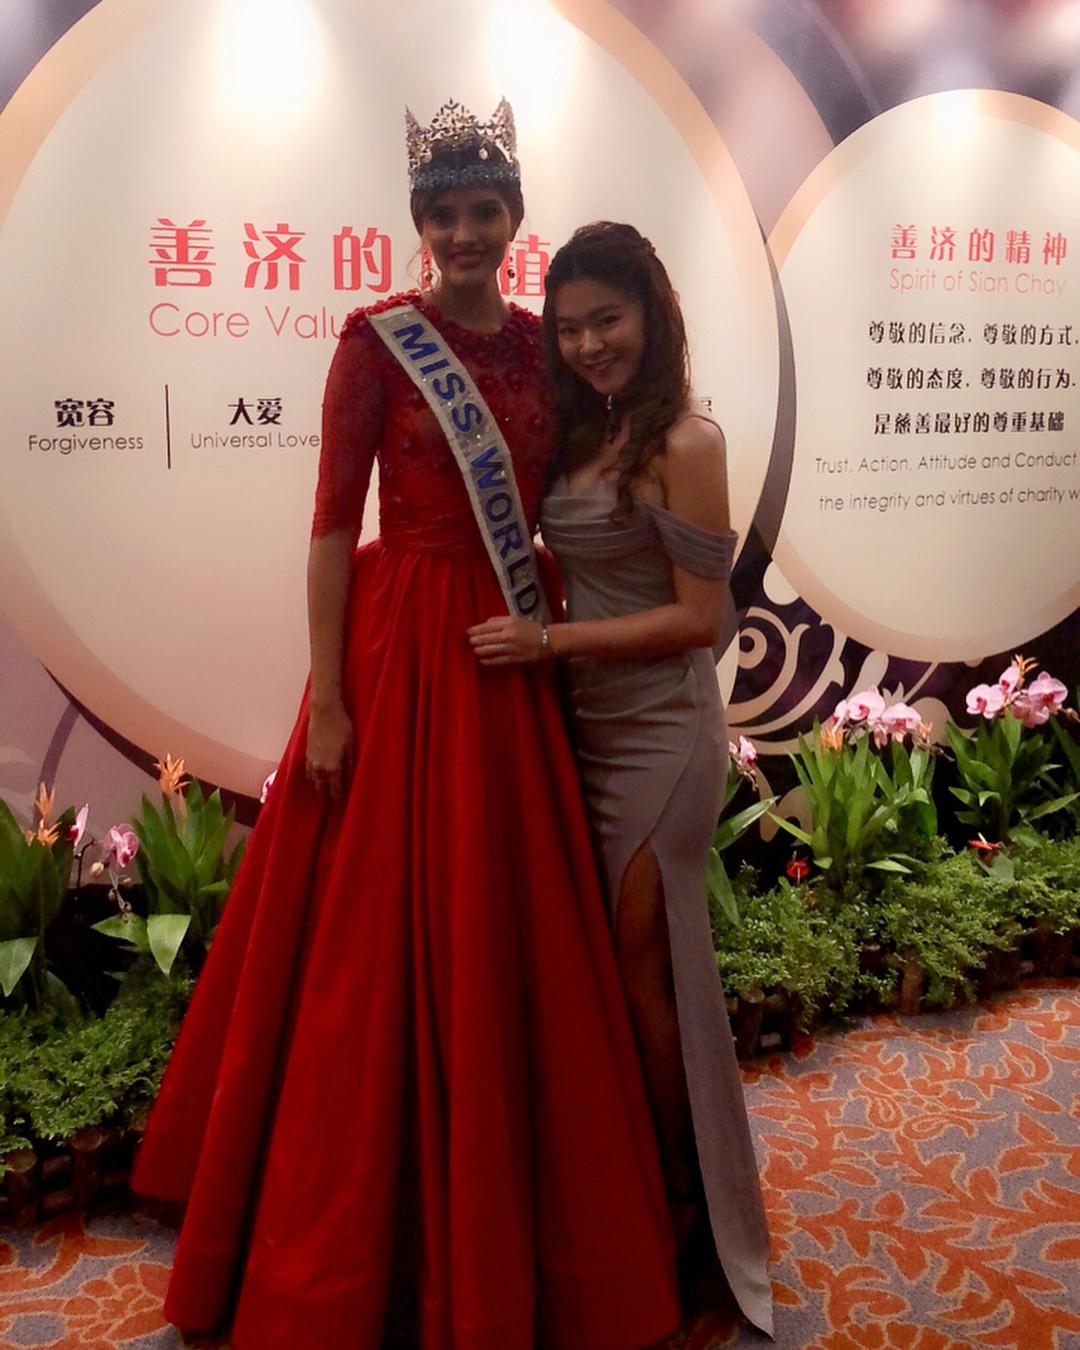 miss world 2016 durante tour de beauty with a purpose em singapore. 39330811